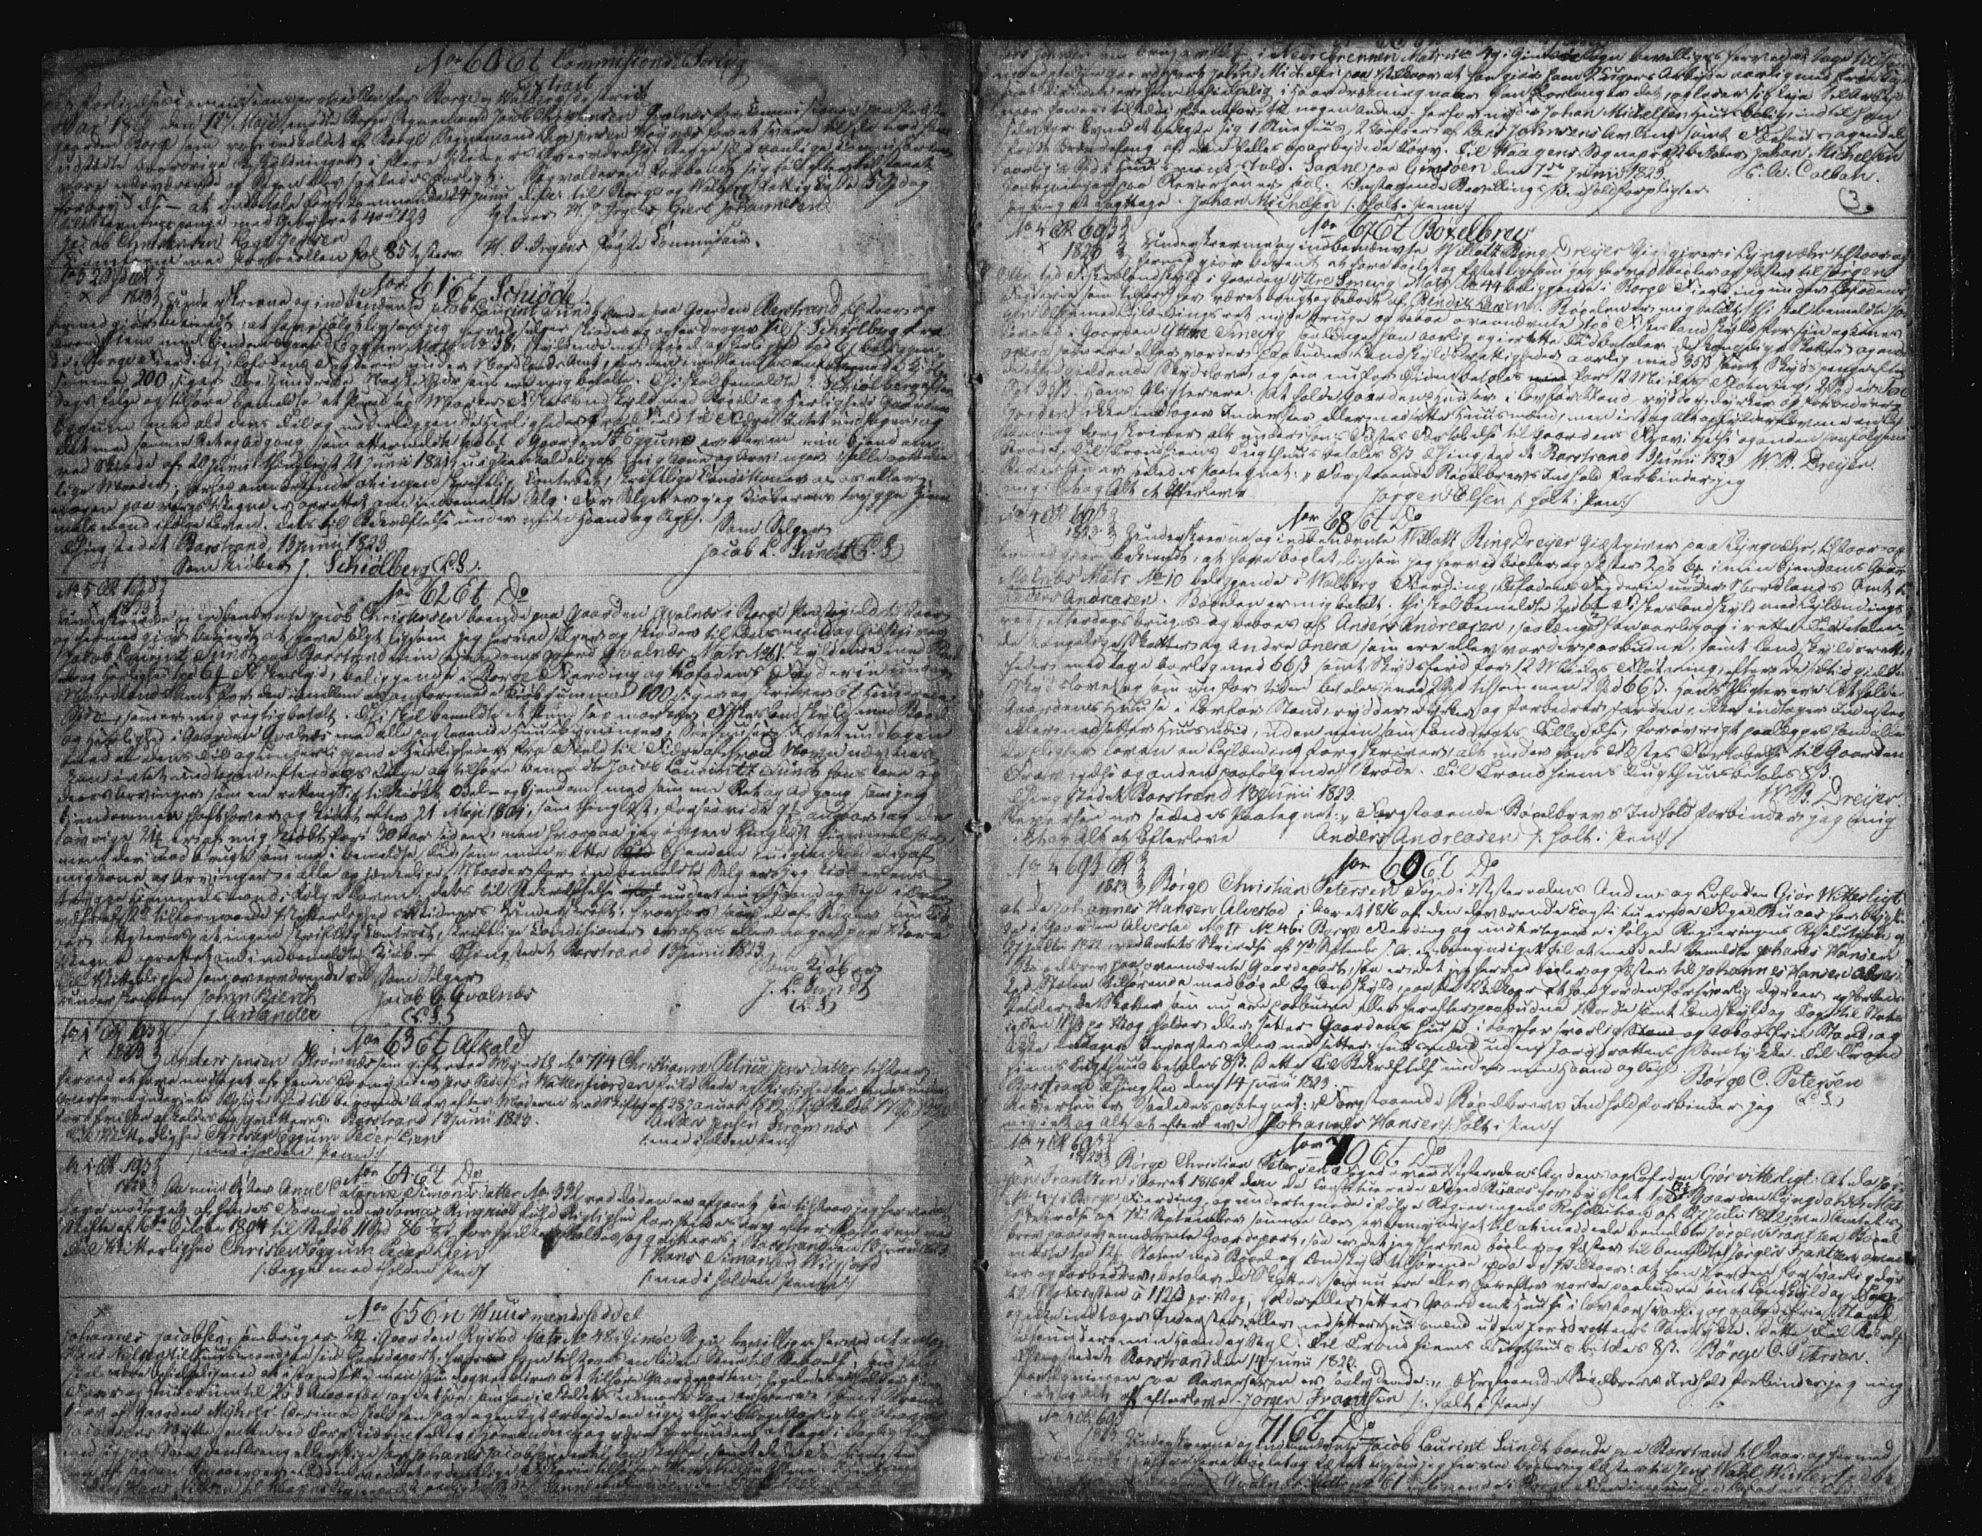 SAT, Vesterålen sorenskriveri, 2/2Ca/L0007: Pantebok nr. G, 1823-1836, s. 3